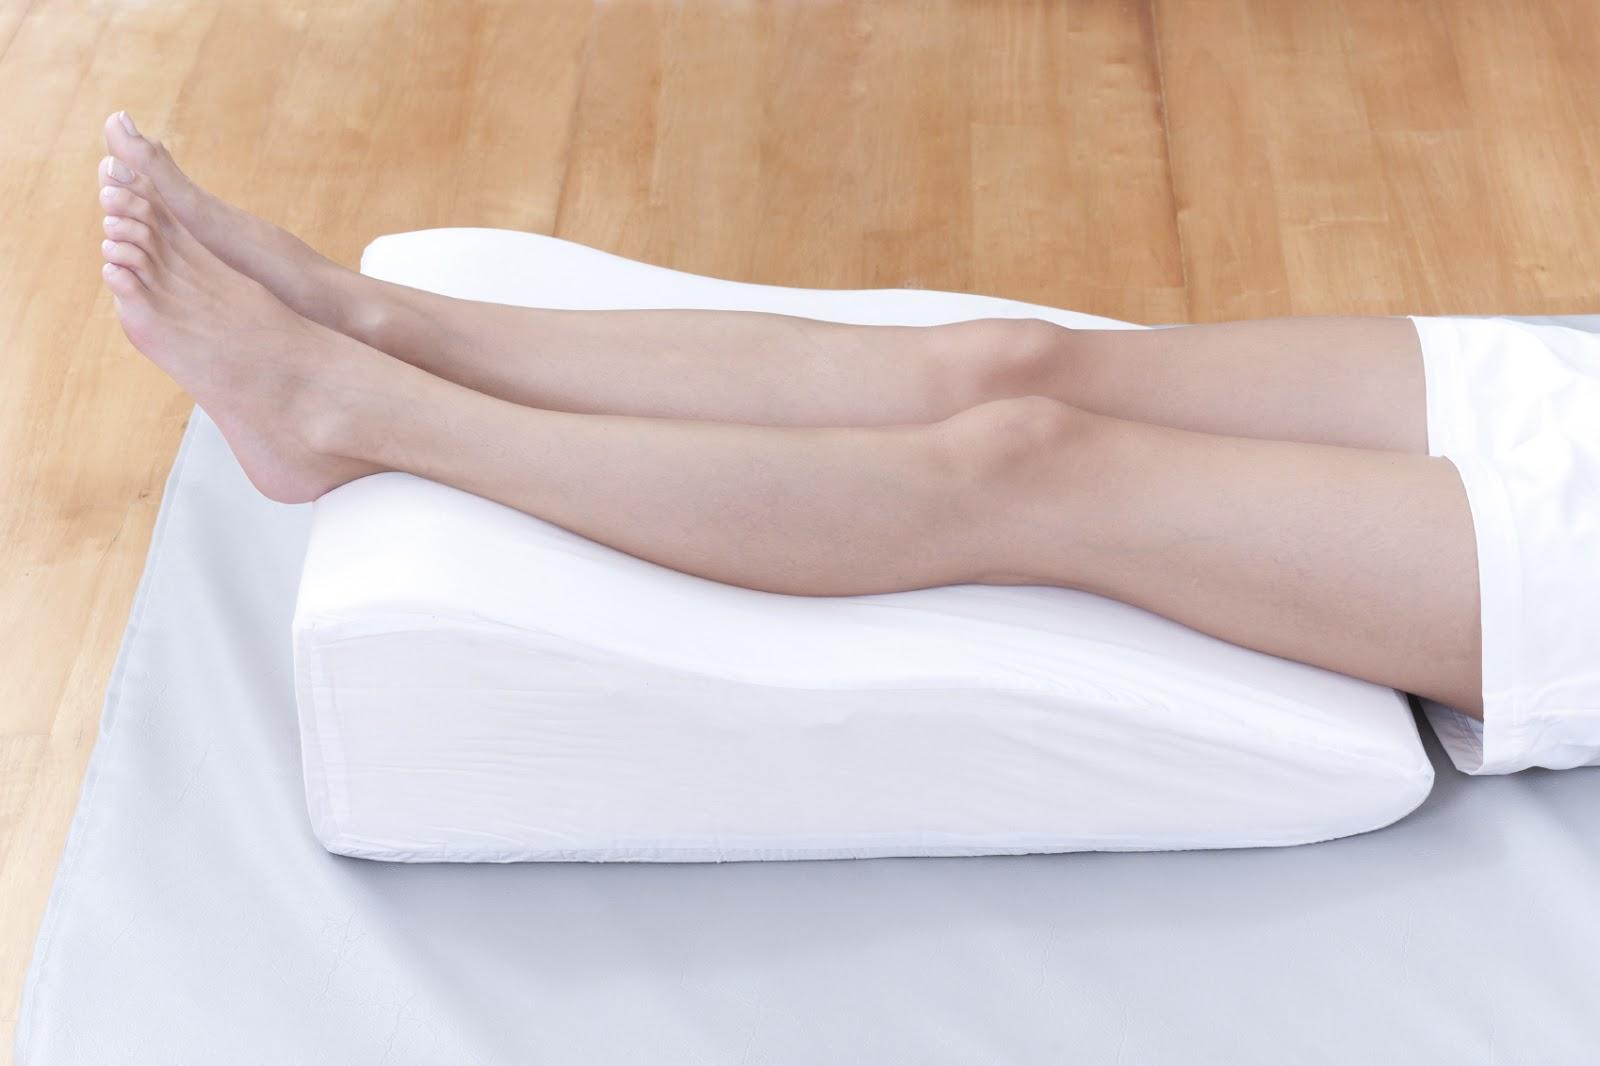 varicose veins elevation legs